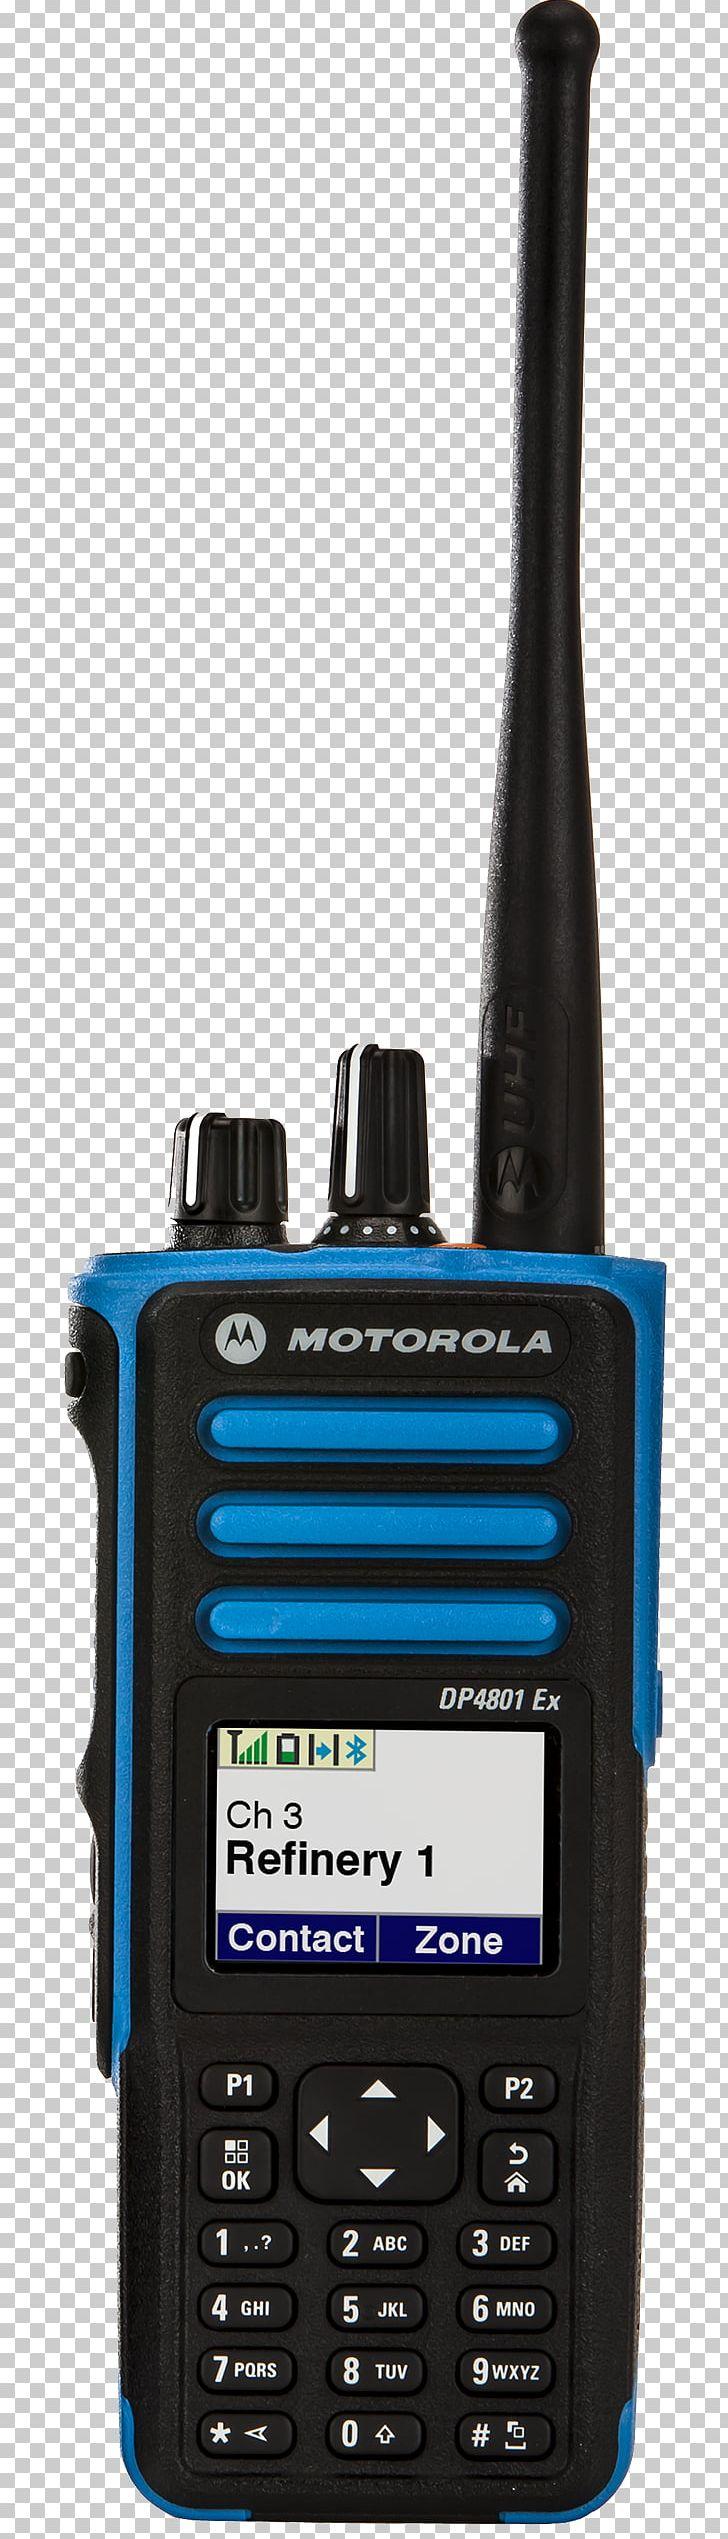 Two-way Radio Motorola Walkie-talkie Digital Mobile Radio PNG, Clipart, Atex Directive, Barbar, Digital Mobile Radio, Electronic Device, Electronics Free PNG Download